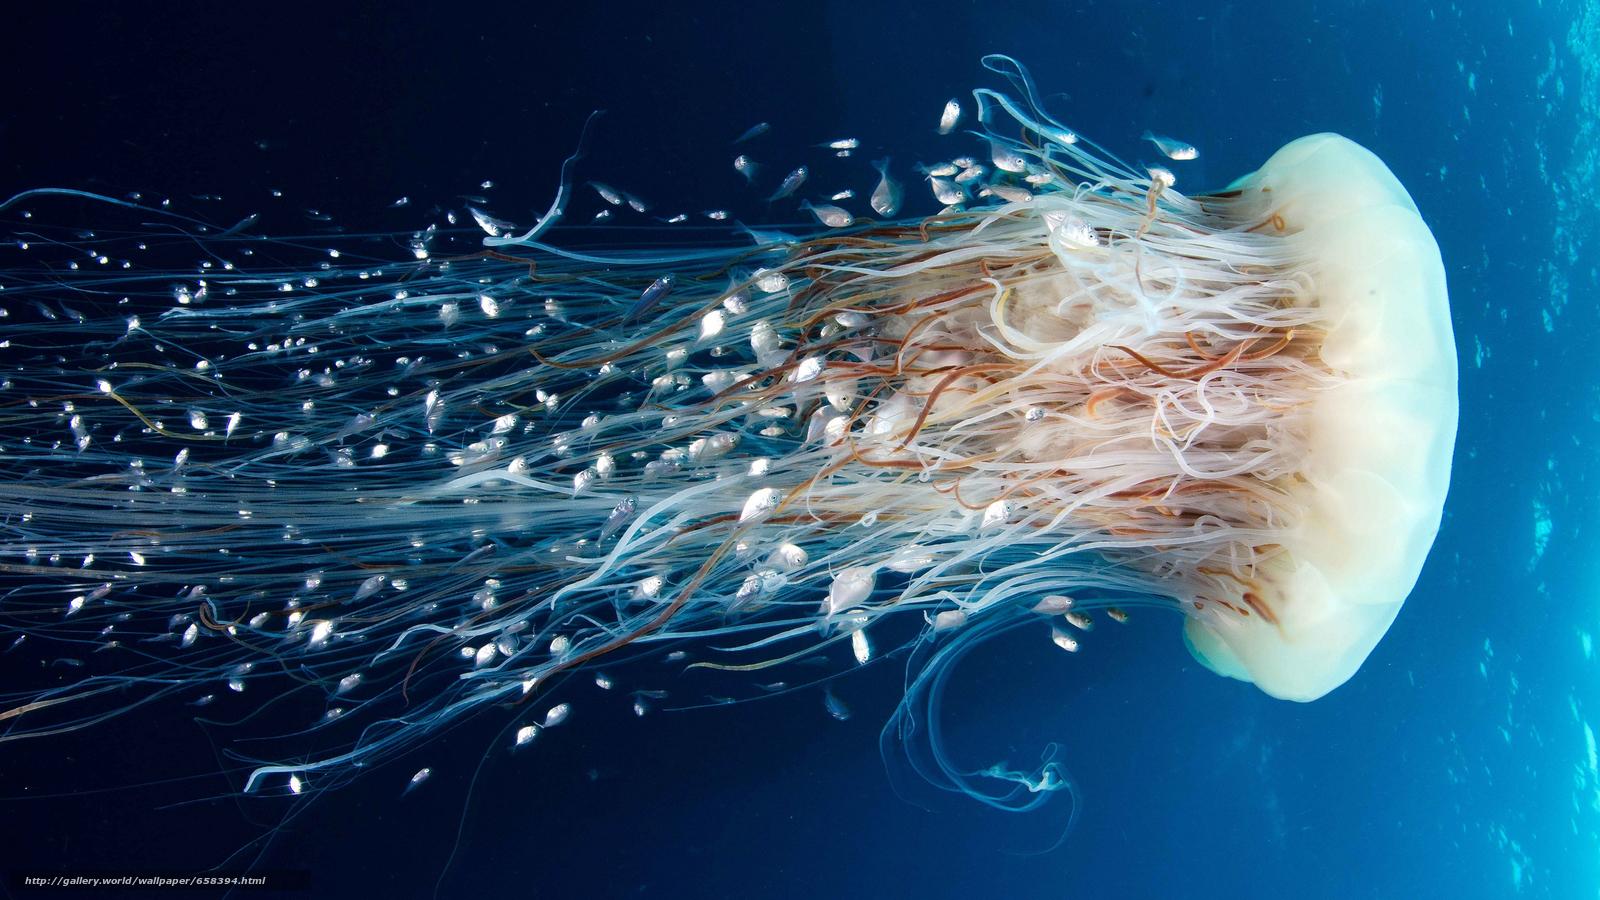 Descargar gratis medusa,  Medusa,  Mundial de Actividades Subacuáticas,  agua Fondos de escritorio en la resolucin 5000x2812 — imagen №658394